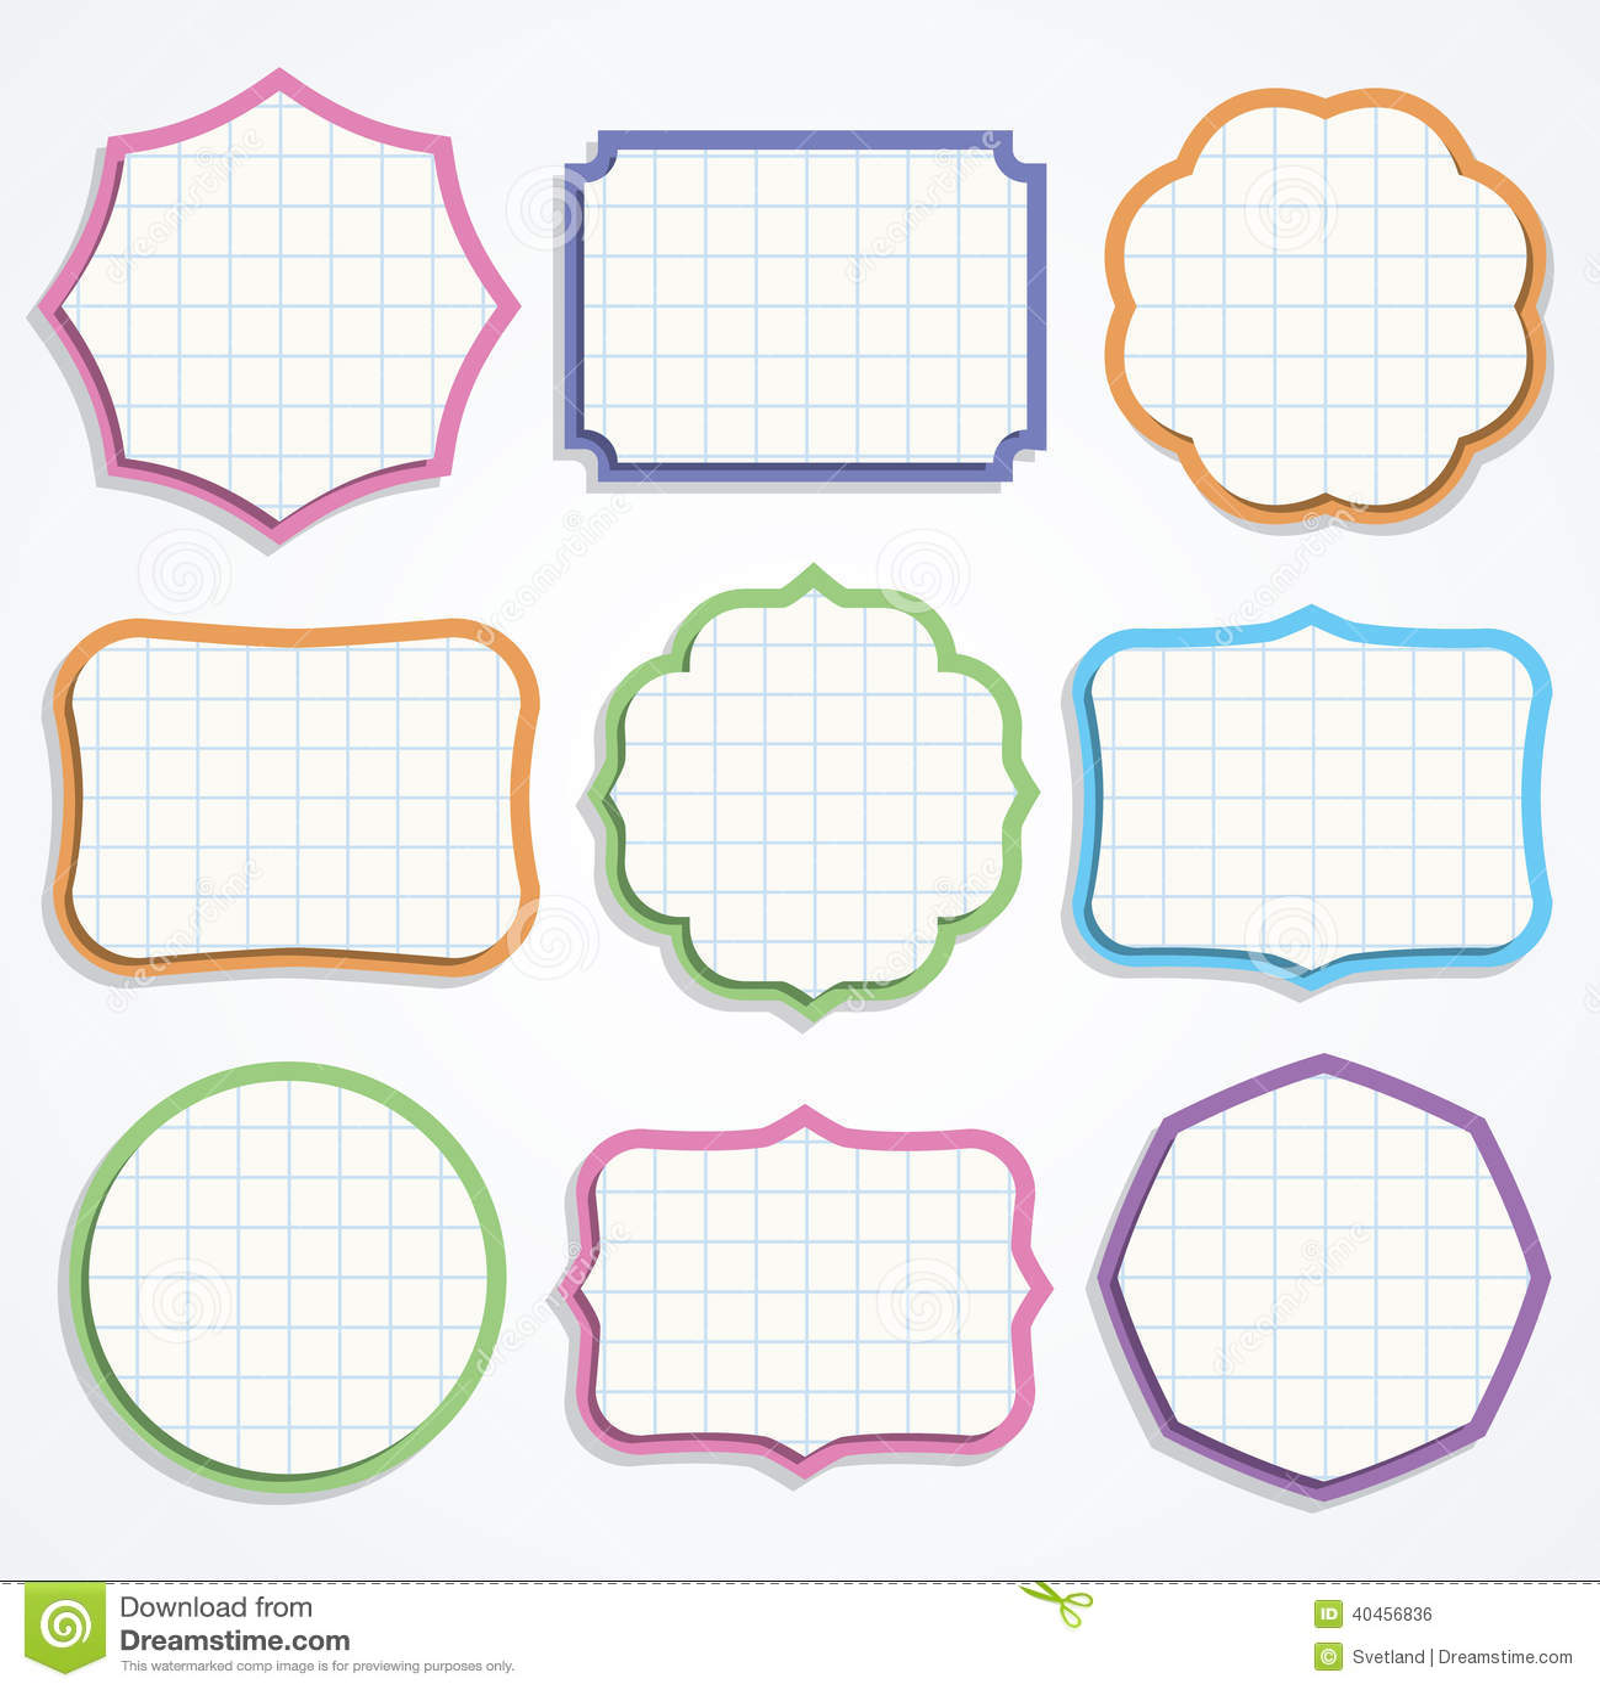 colorful note paper shapes stock vector image 40456836. Black Bedroom Furniture Sets. Home Design Ideas